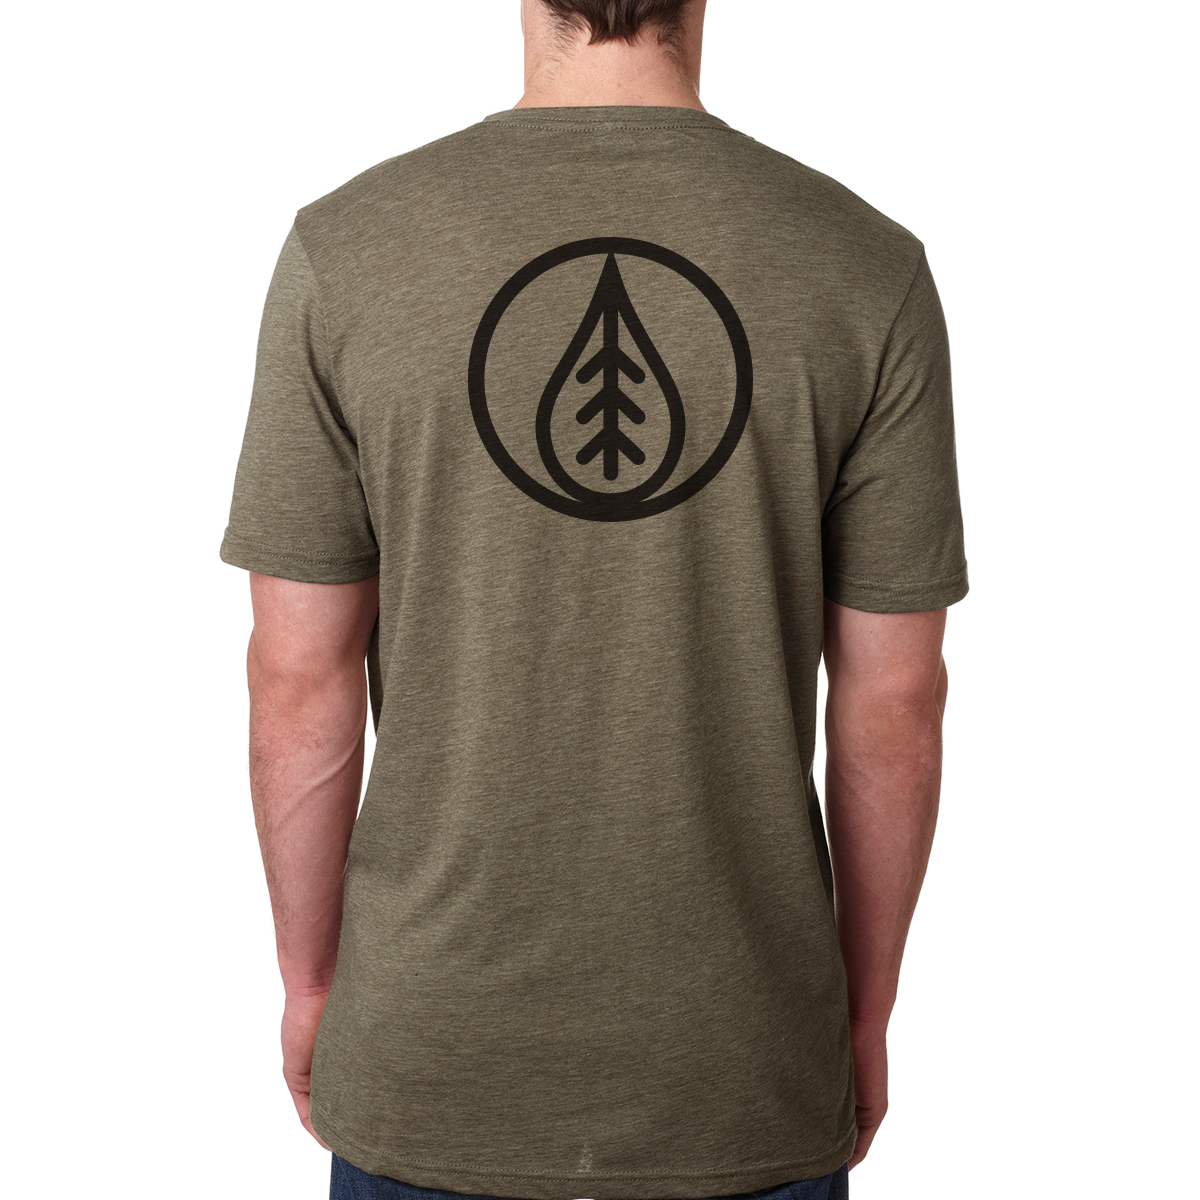 Logo T-Shirt // $20